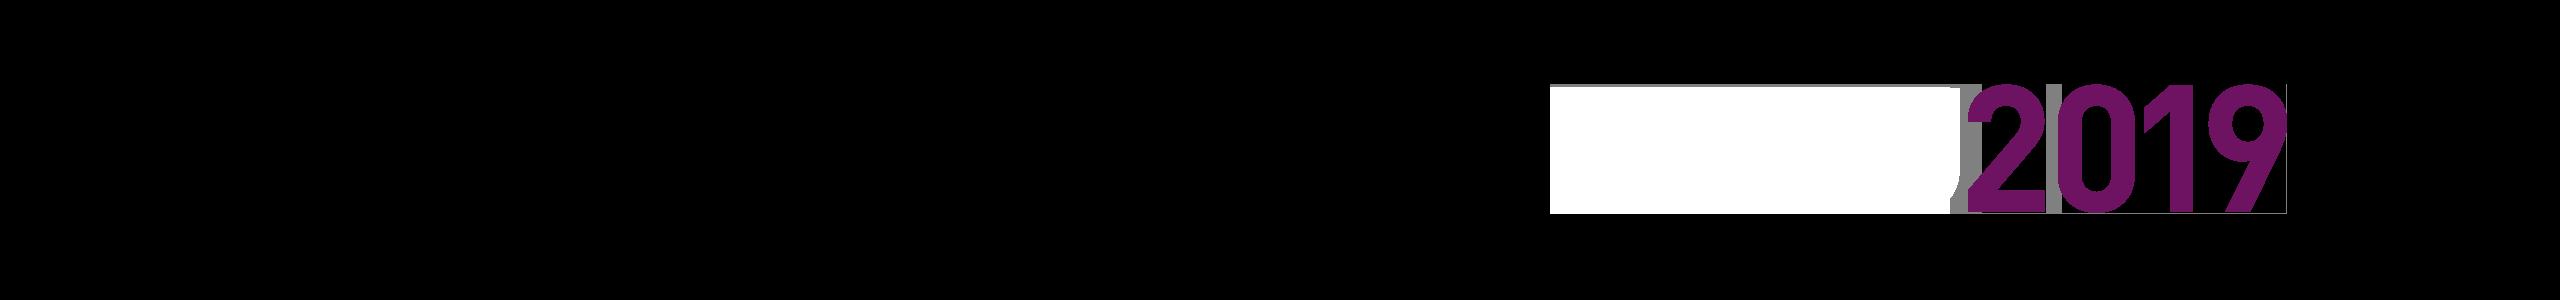 DKOU2019 Logo